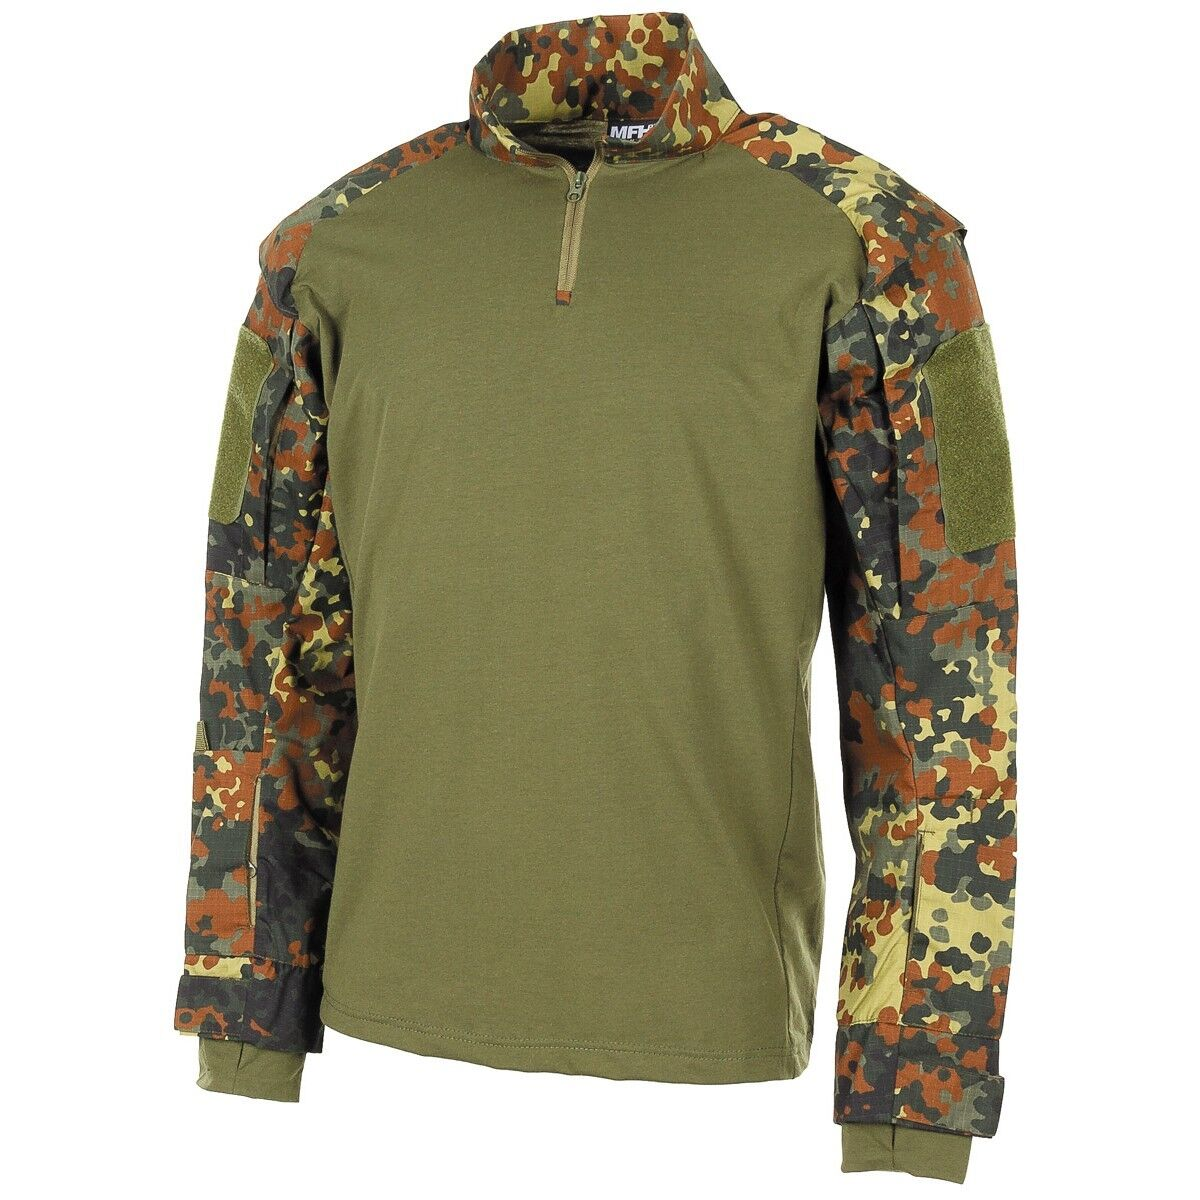 MFH Camiseta camiseta táctica militar de los Estados Unido BW camo